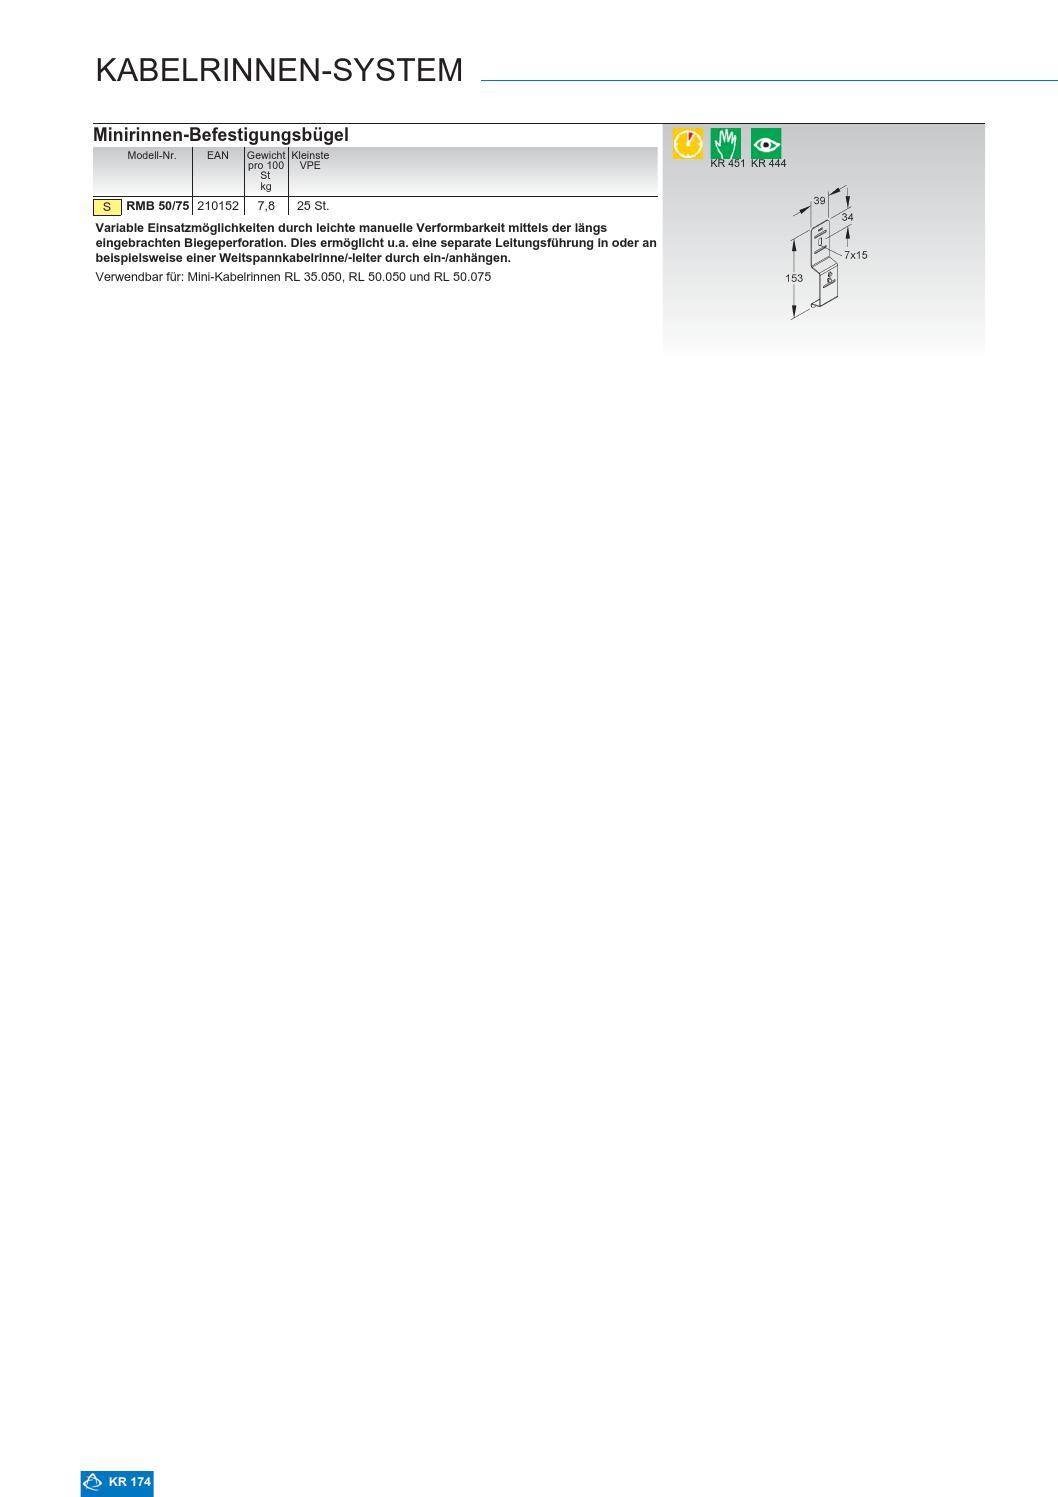 Cataloog Niedax Kabeltragsysteme 2012 DE by W247.BE - issuu